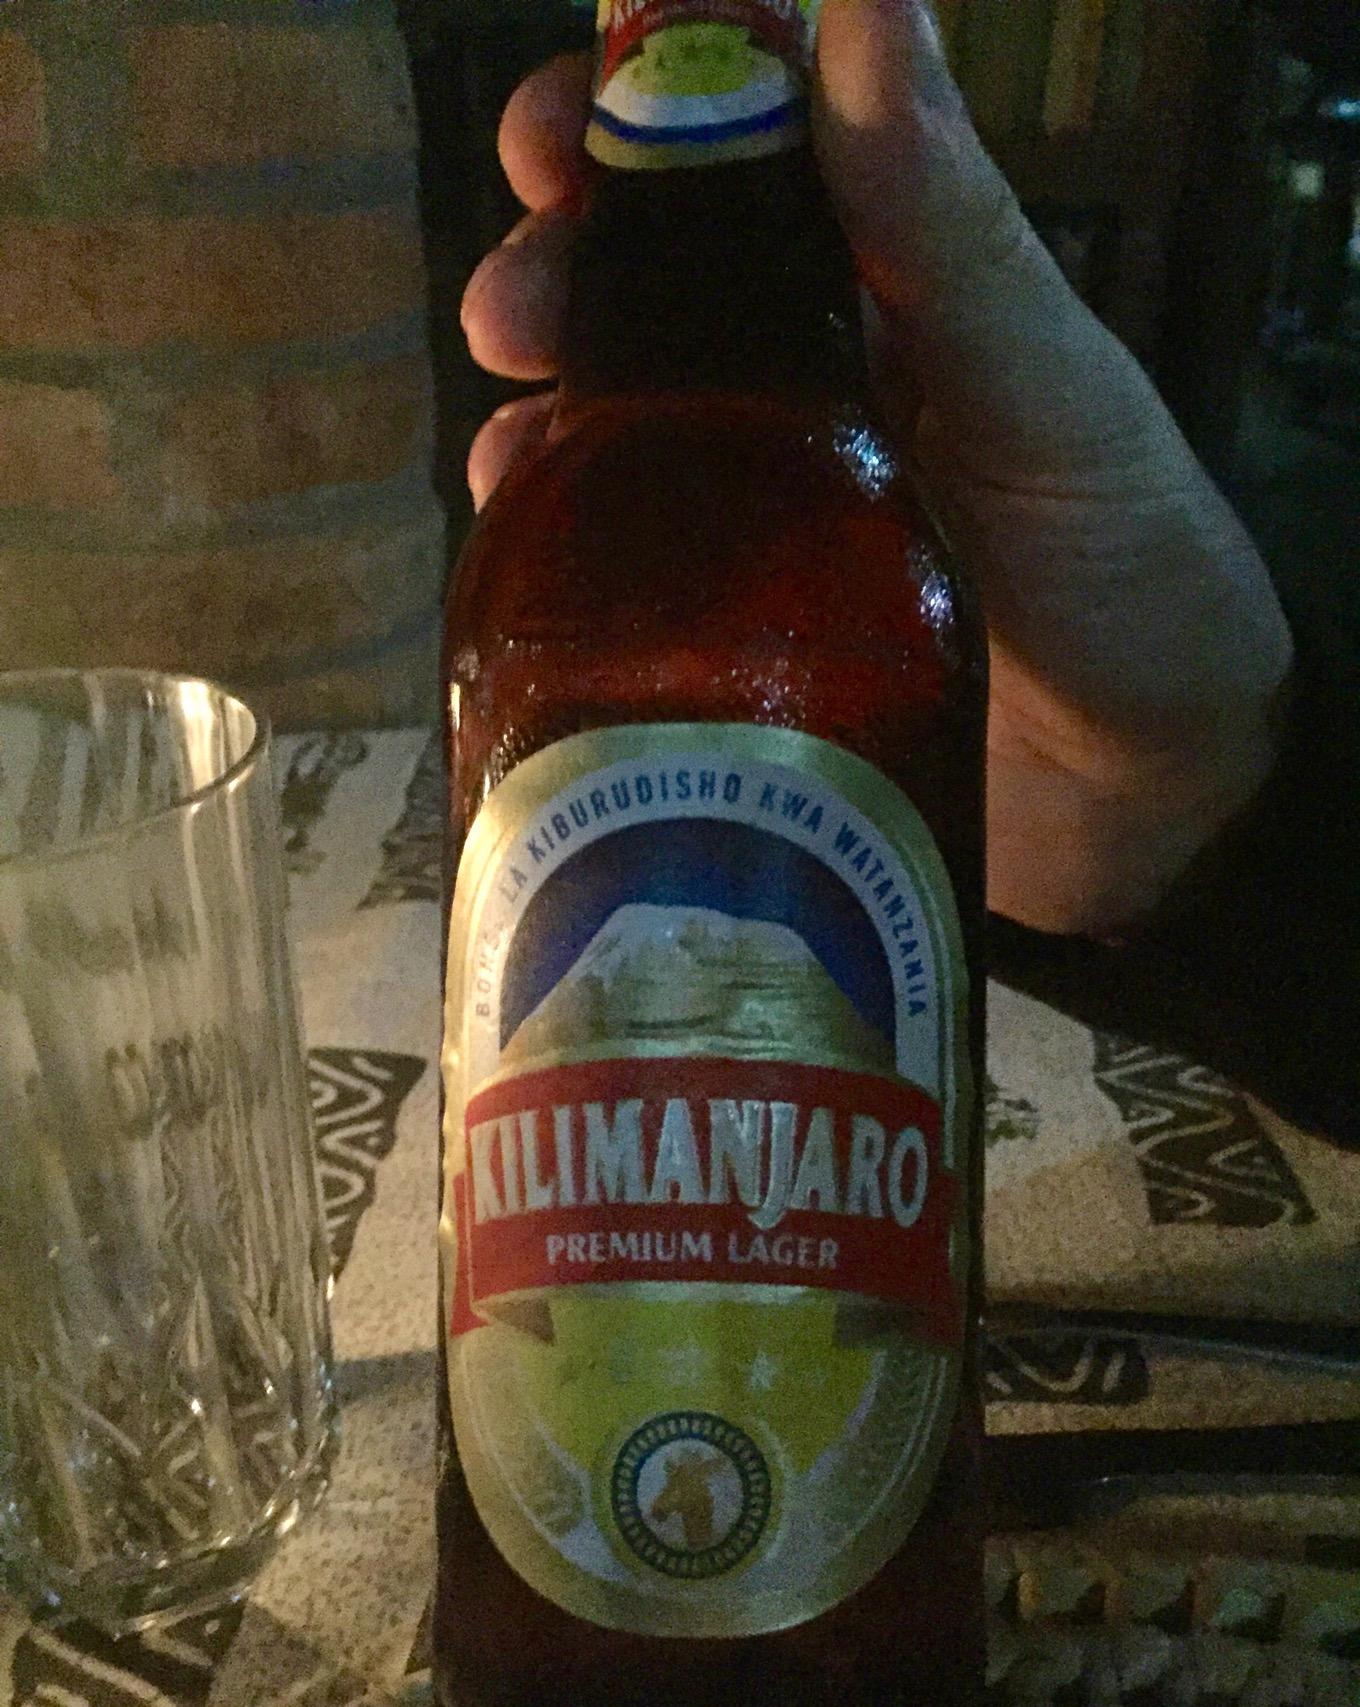 Bière du Kilimandjaro et diner au Ambureni Coffee Lodge